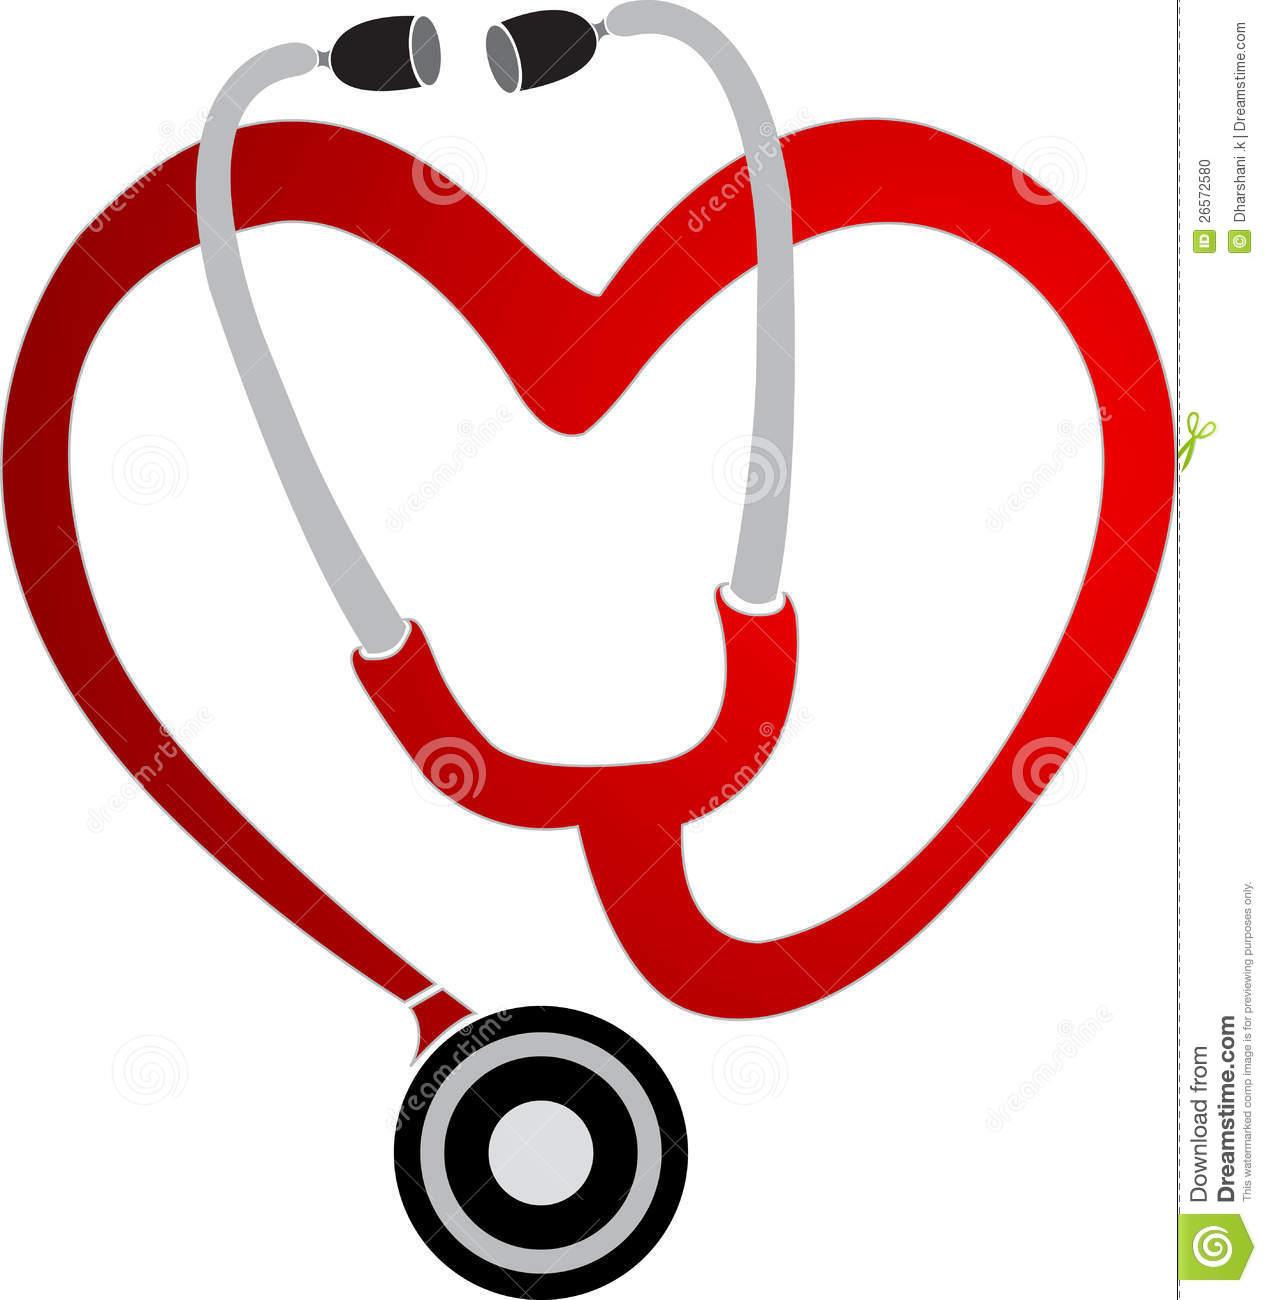 1267x1300 Images For Gt Stethoscope Border Clip Art Nurse